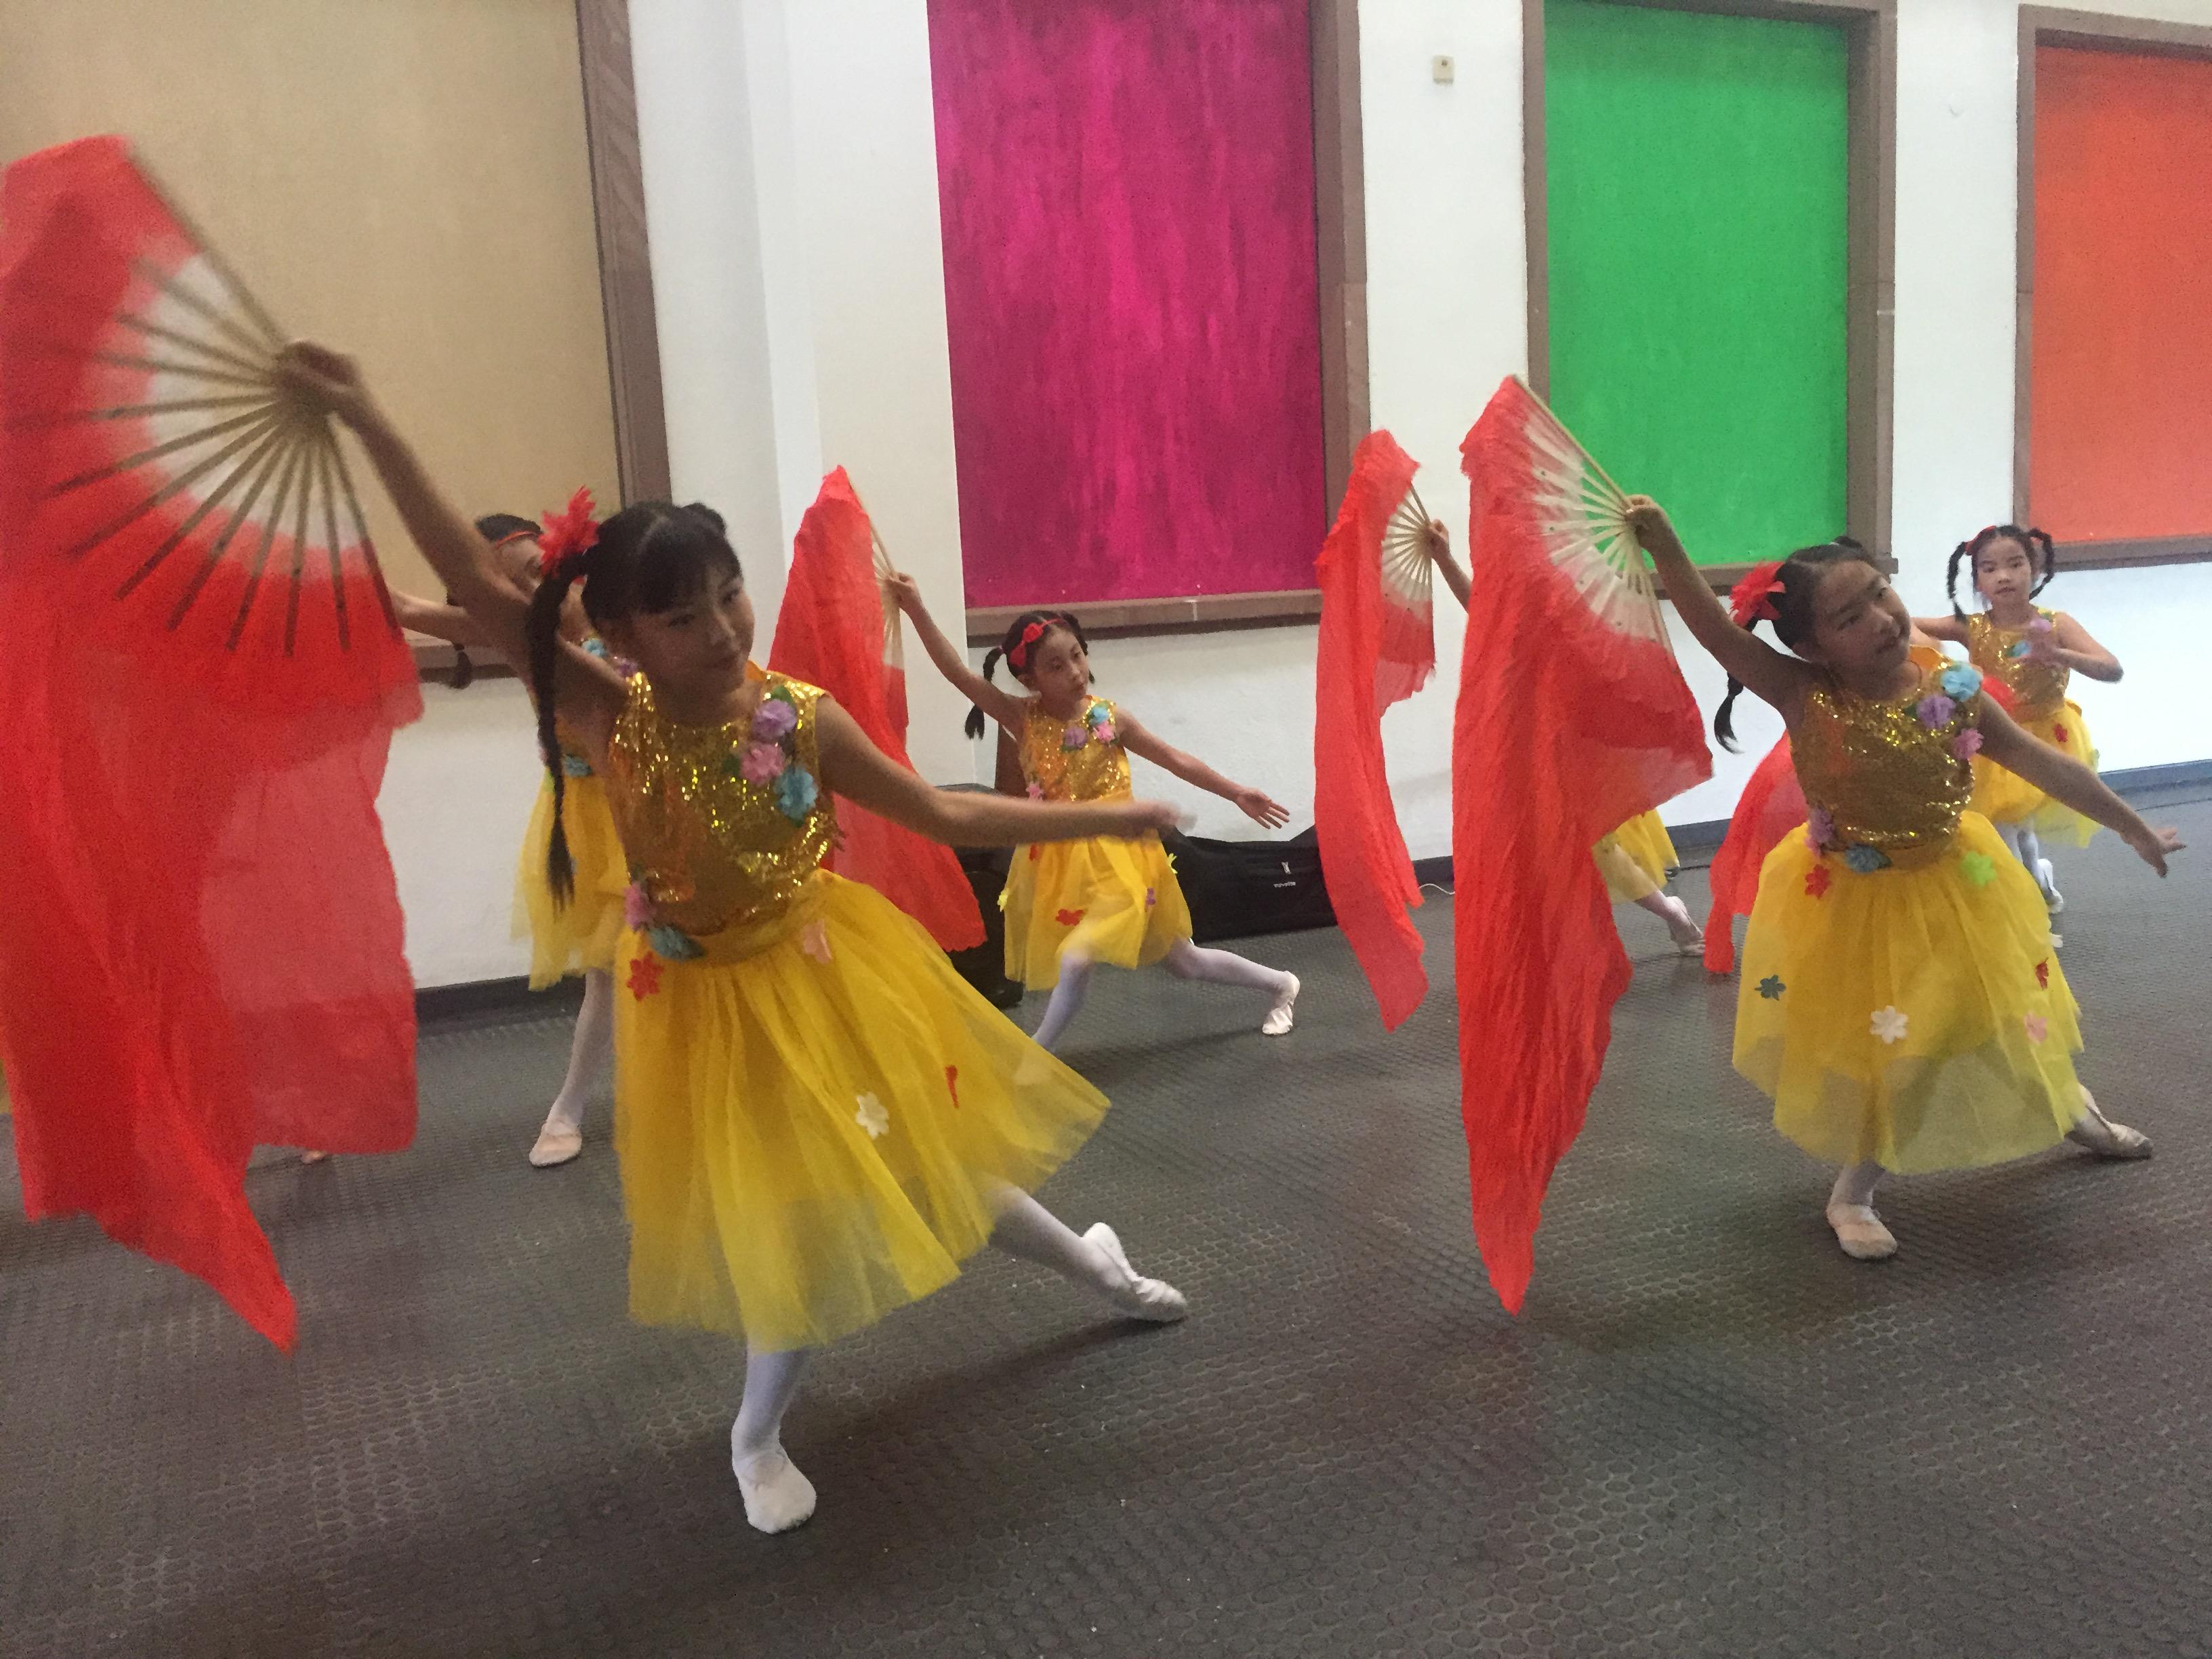 Mit Hingabe tanzte das Huayin Ensemble